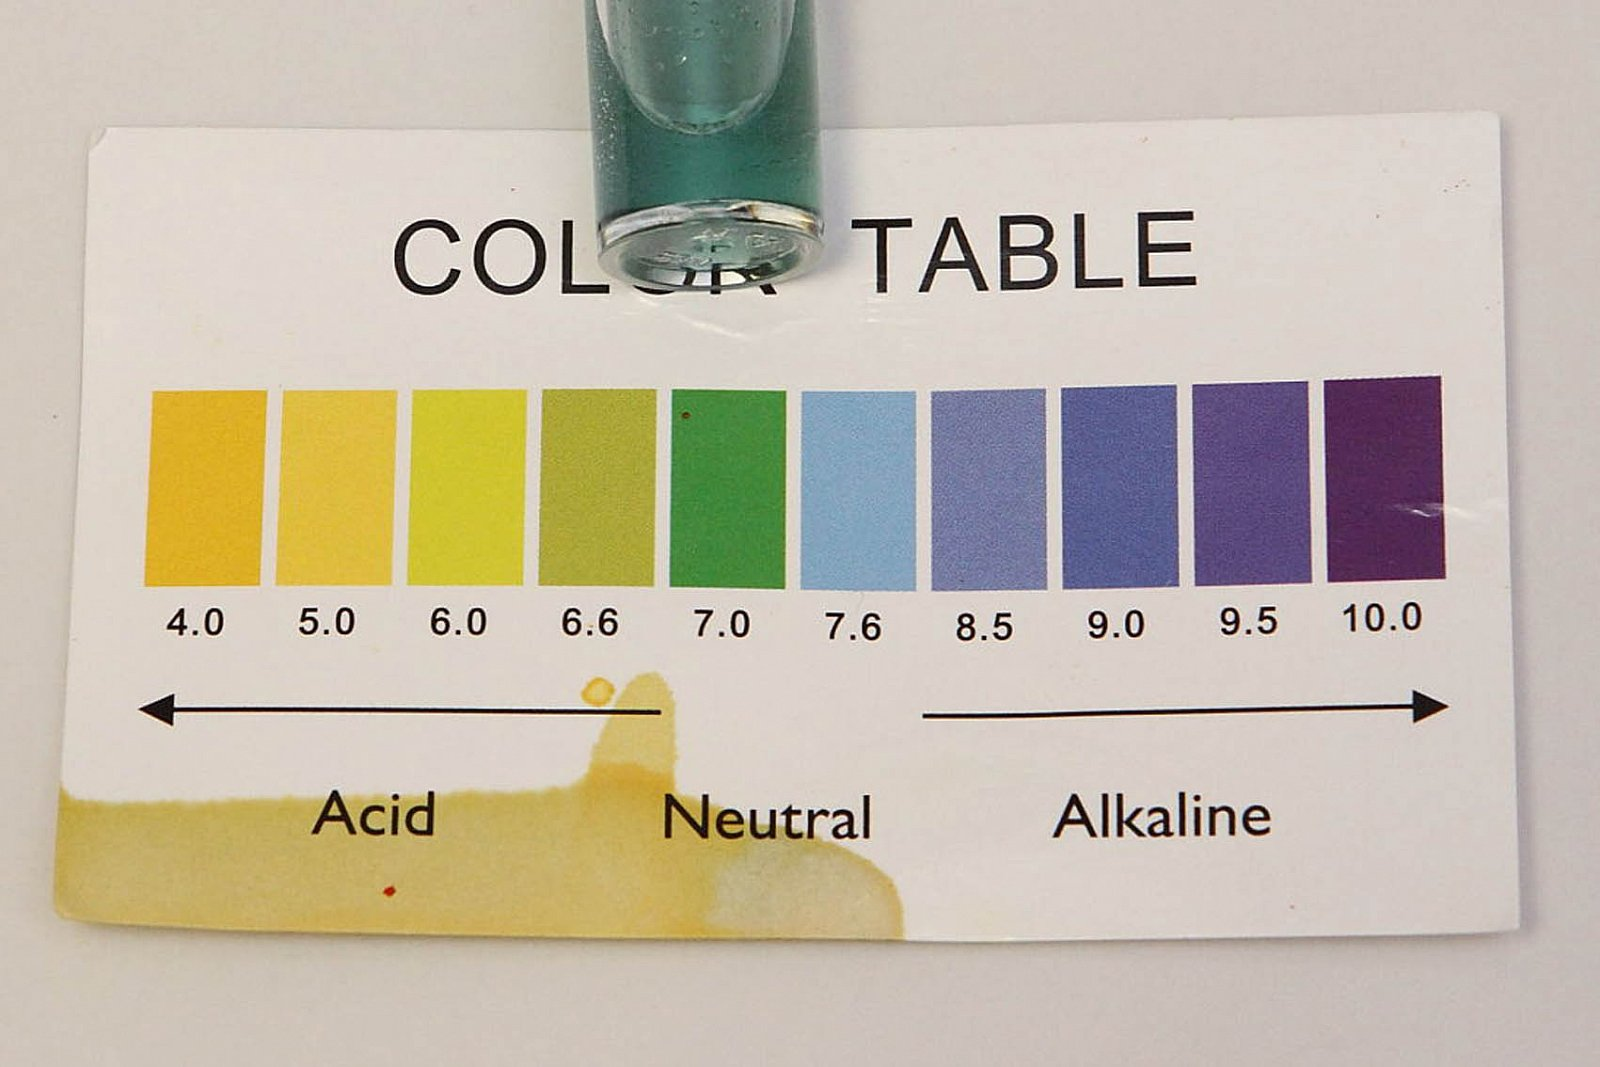 фенолфталеин цветовая таблица